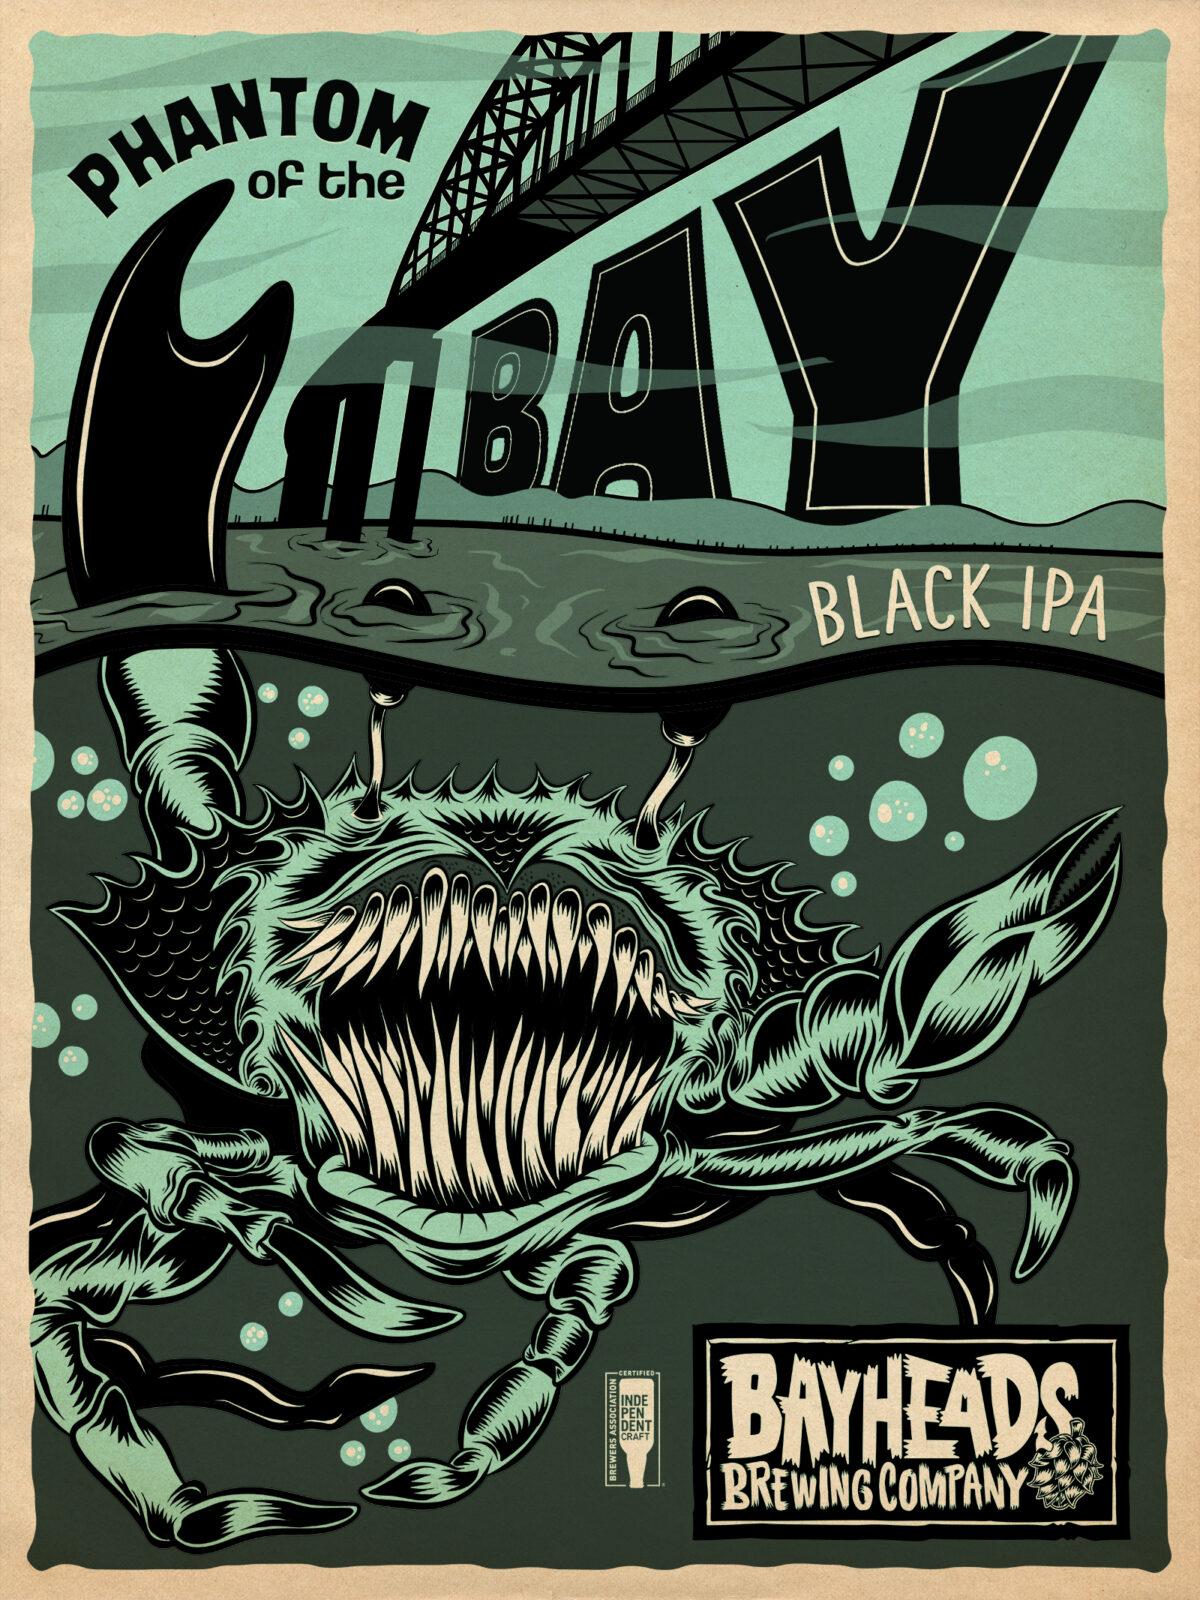 Phantom of the Bay – Bayheads Brewing Company